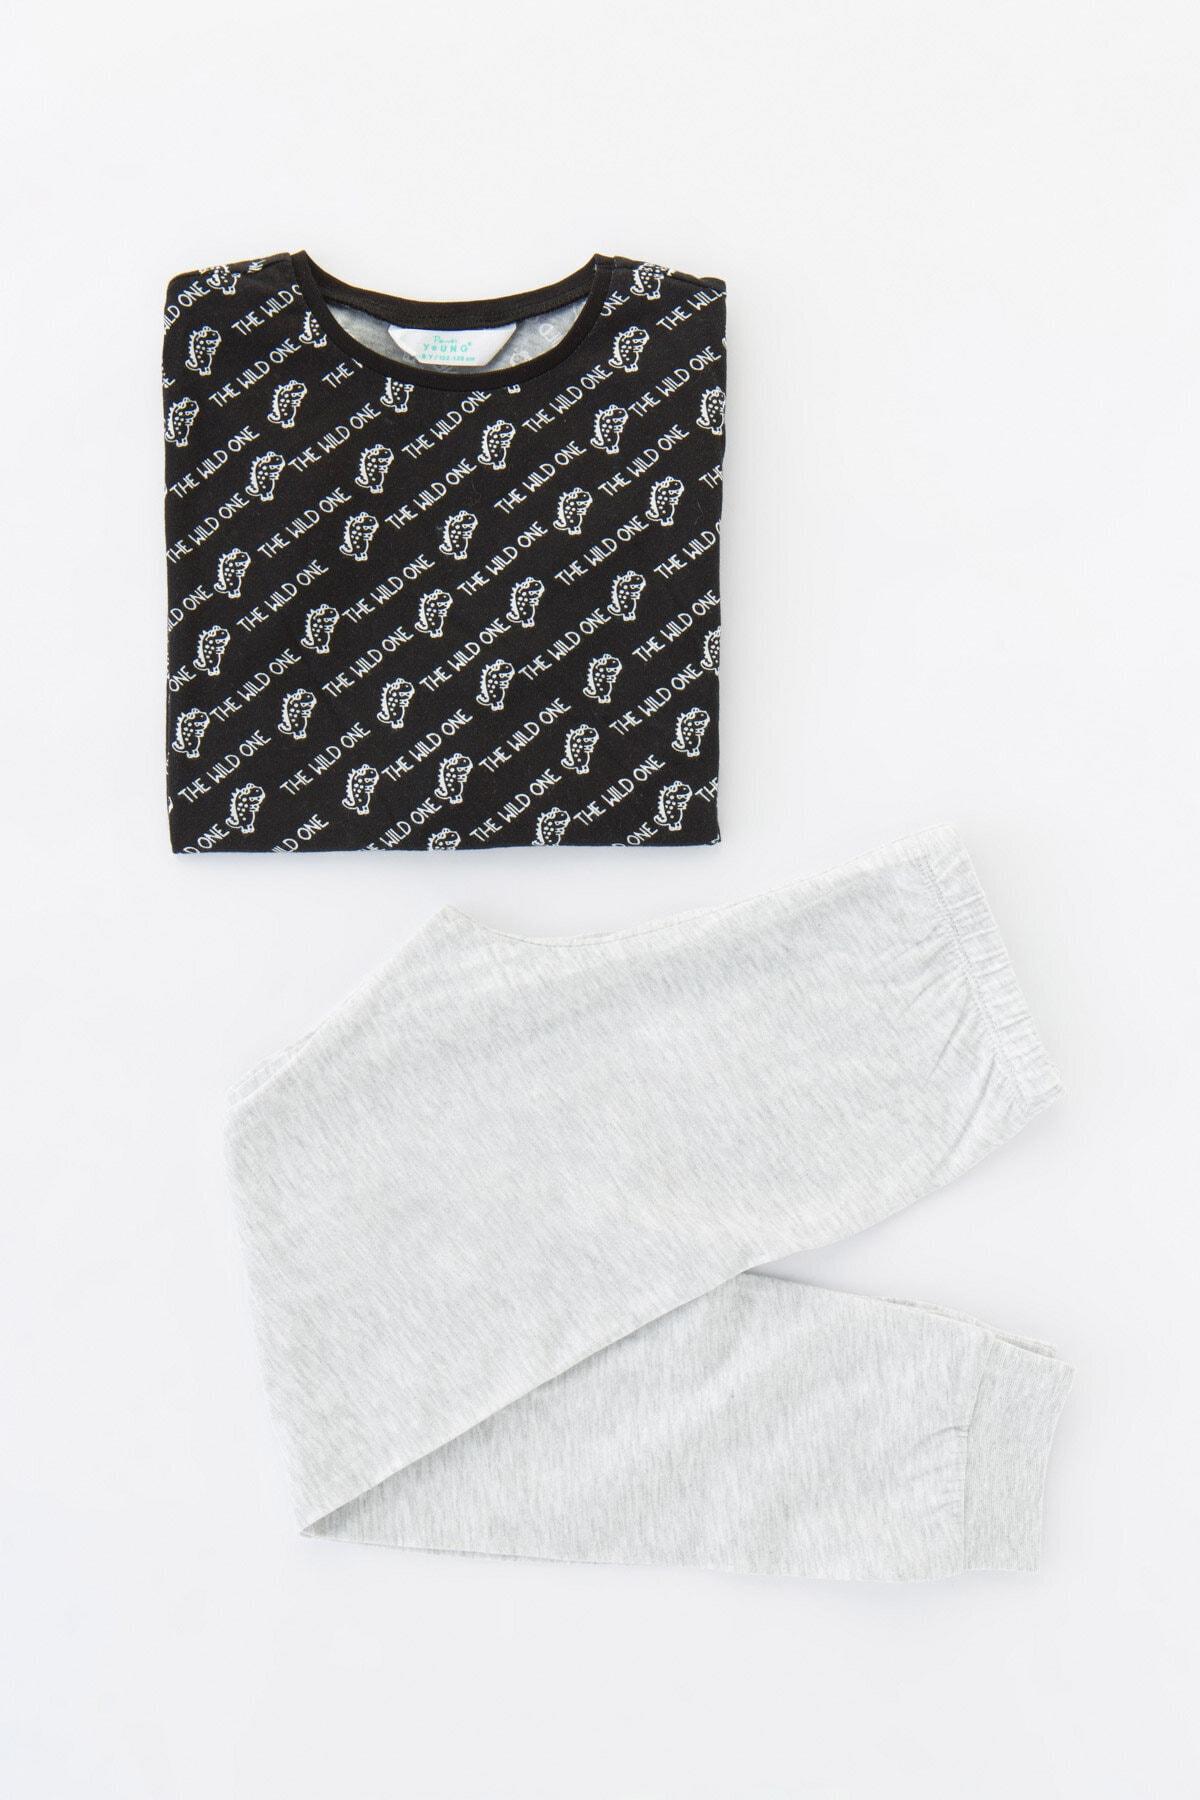 Penti Erkek Çocuk Çok Renkli Wıld One Ls- Ls 4Lü Pijama Takımı